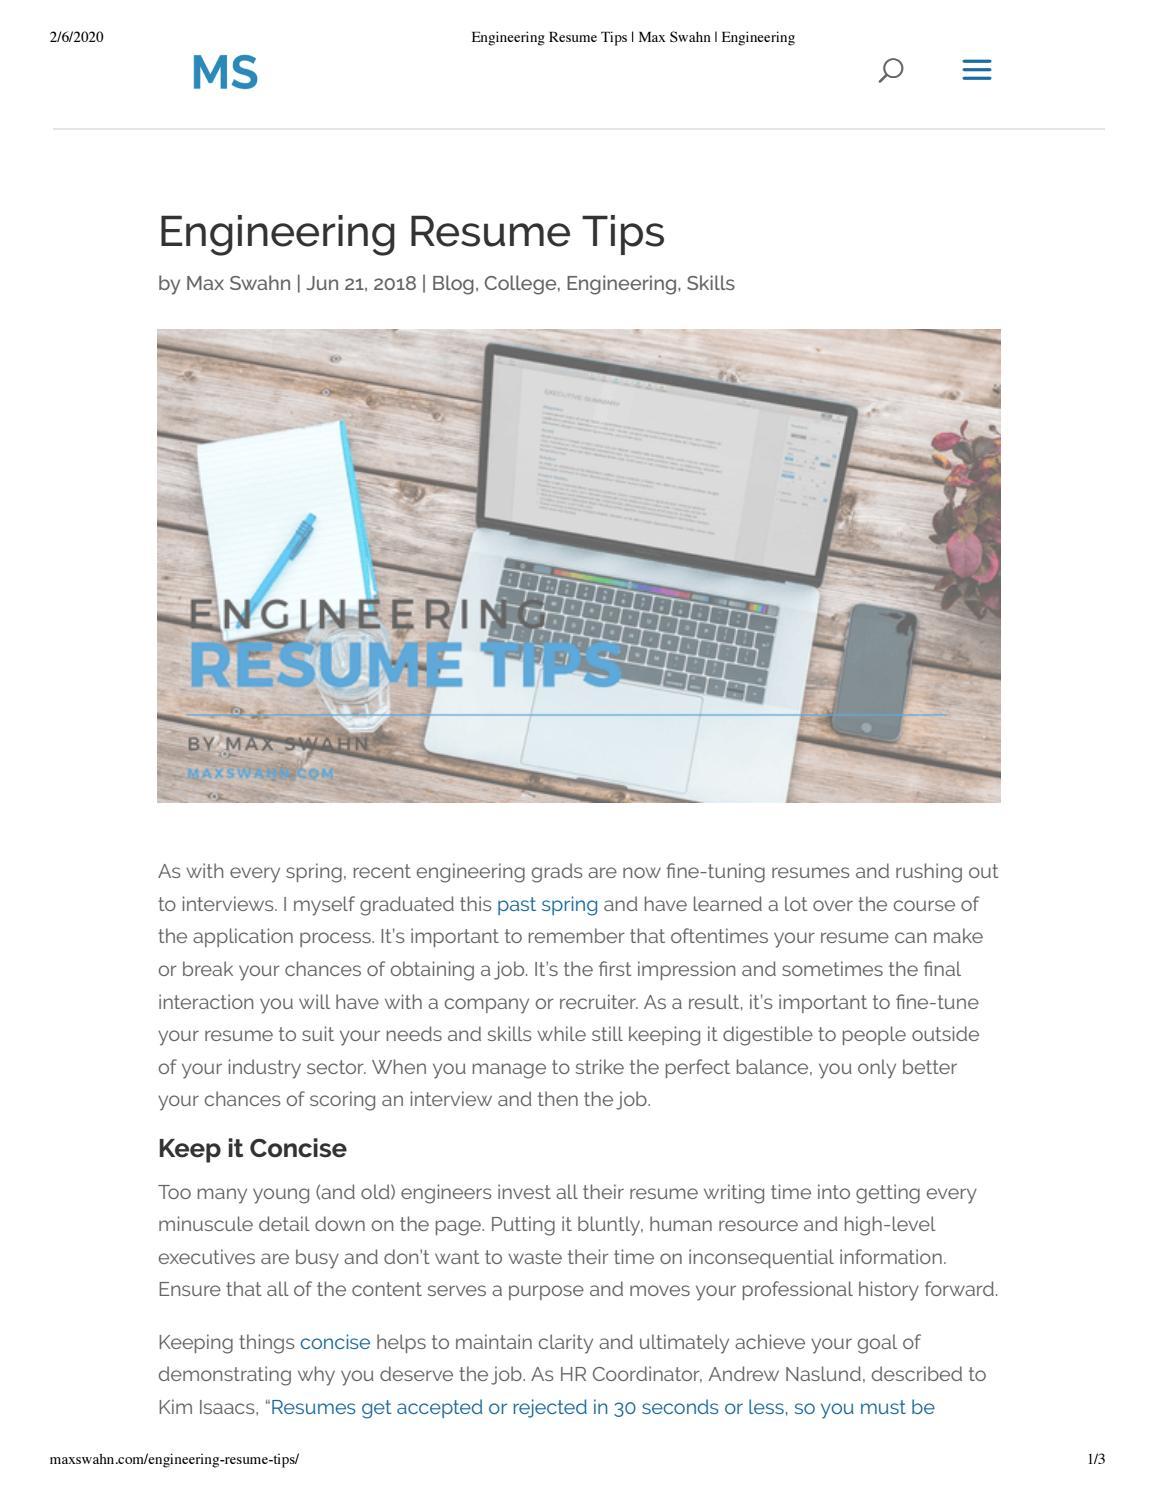 Engineering Resume Tips By Max Swahn Issuu